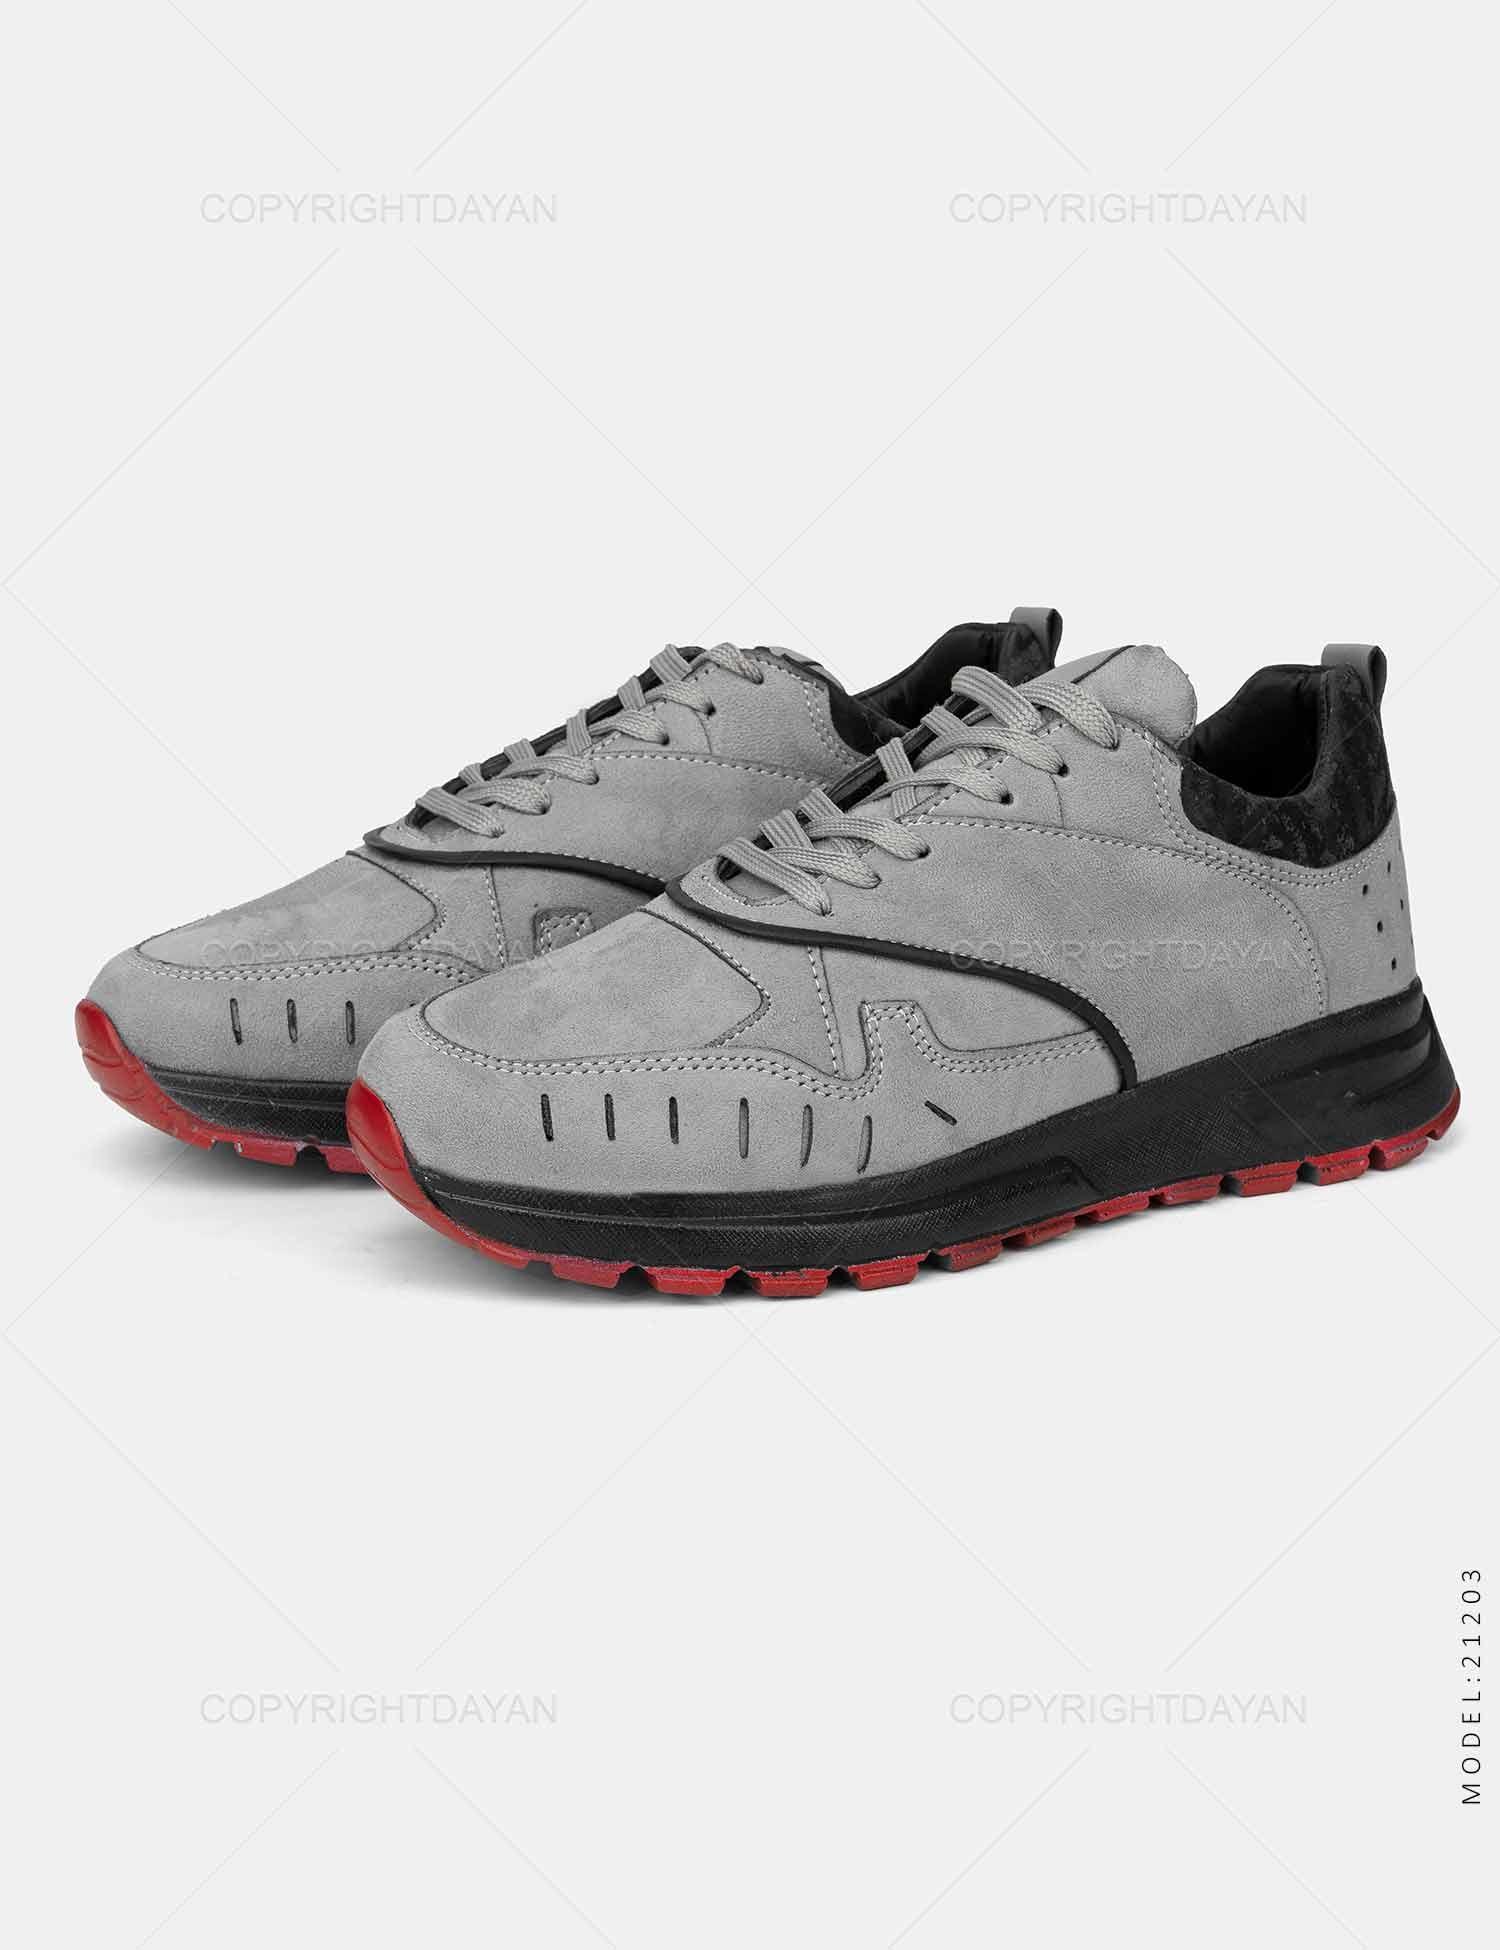 کفش روزمره مردانه Sevin مدل 21203